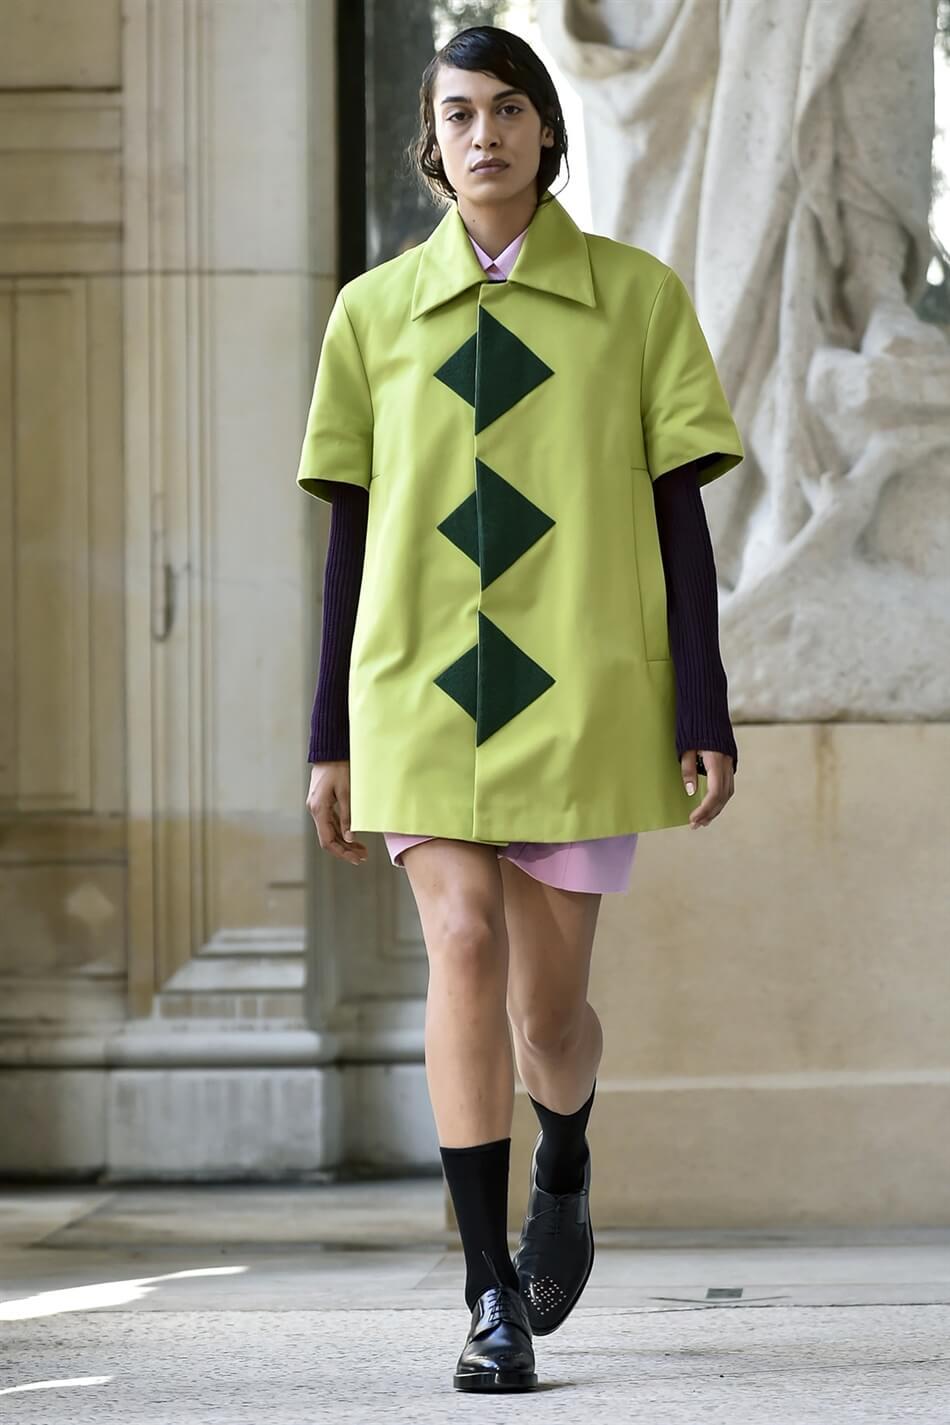 Masculinities Fashionlacemuseum Brussel 010